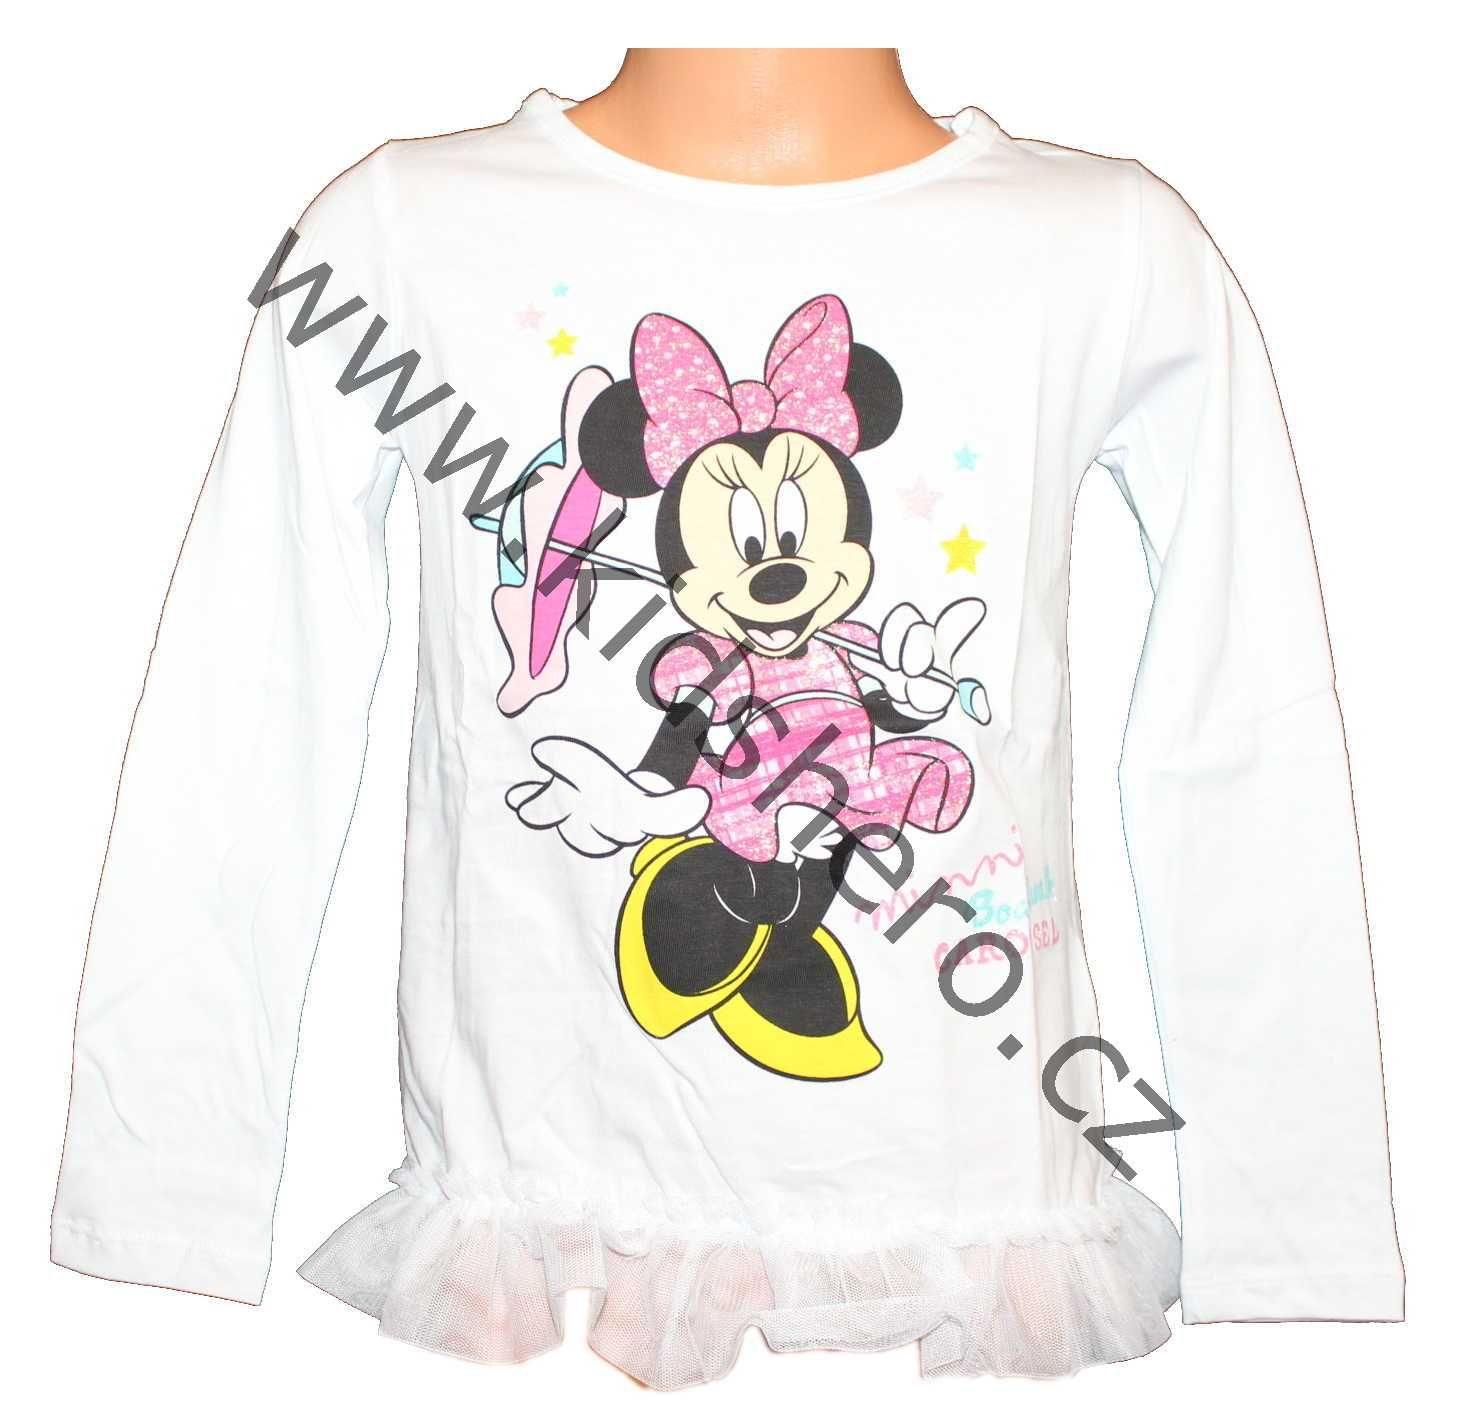 Triko dlouhý rukáv Minnie tunika Minnie dívčí tričko minnie dětské triko minnie tričko disney